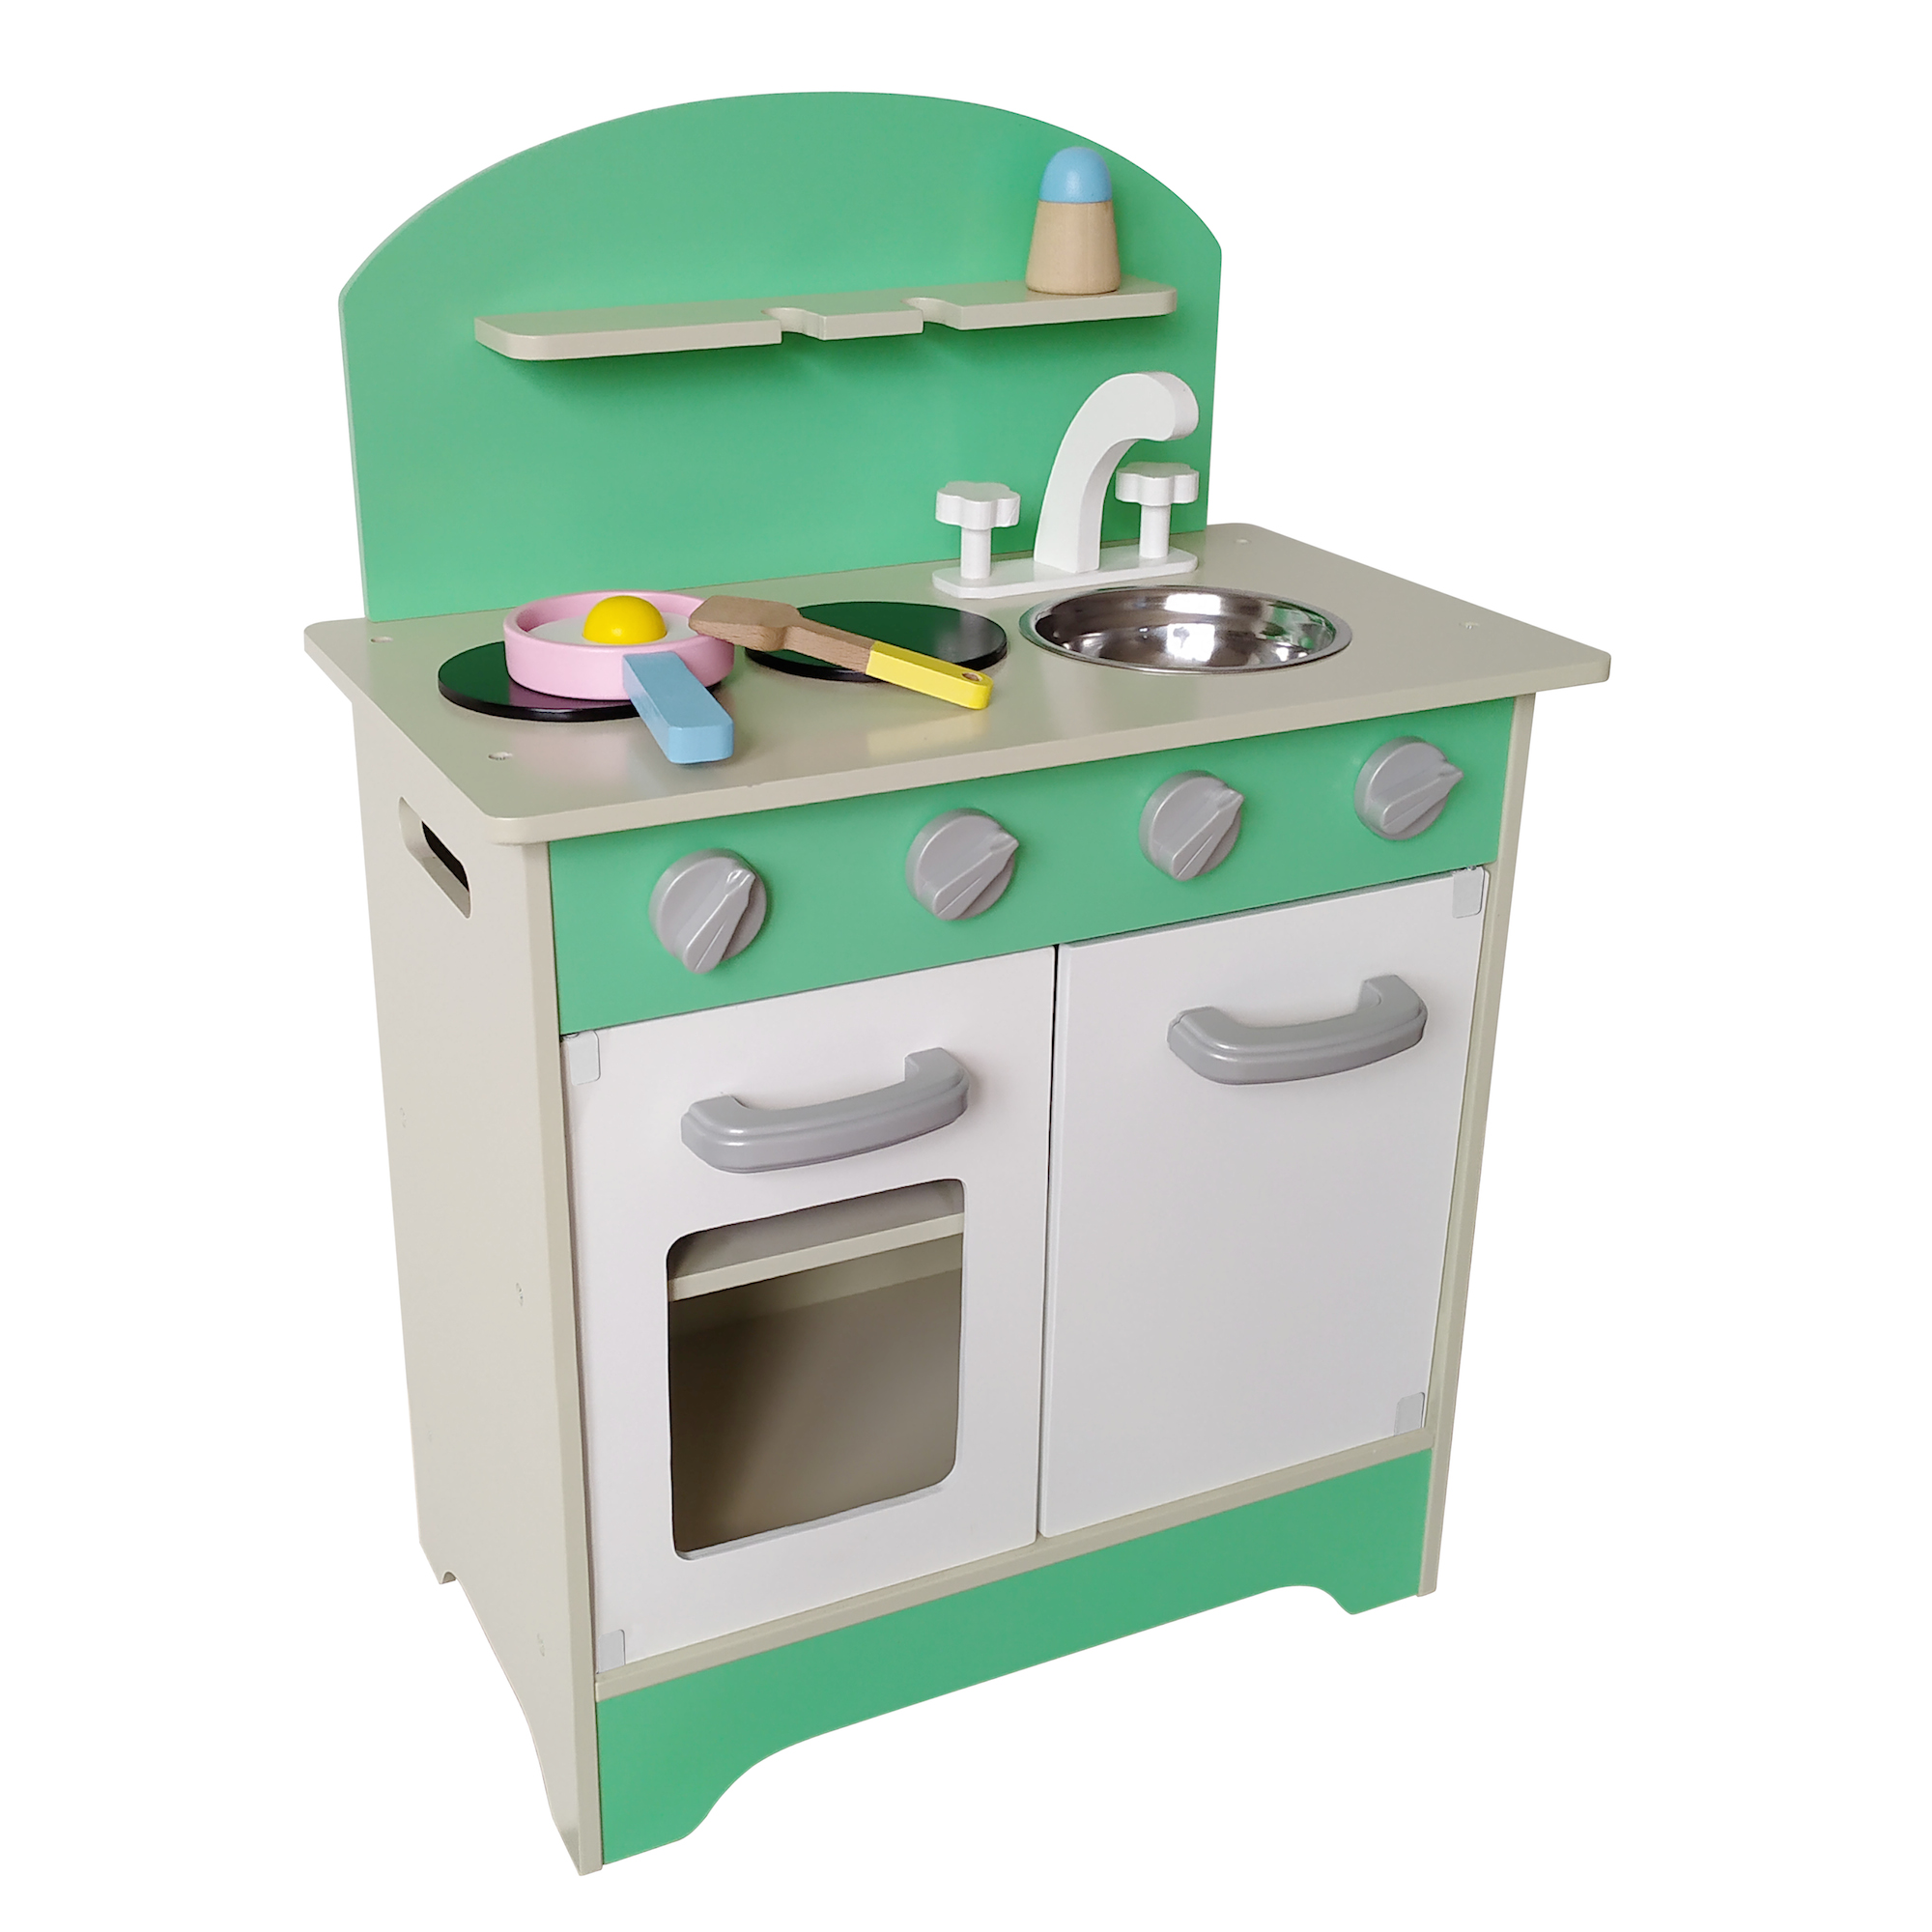 Cocina de Madera Verde - Gamepower - Juguetes de Madera